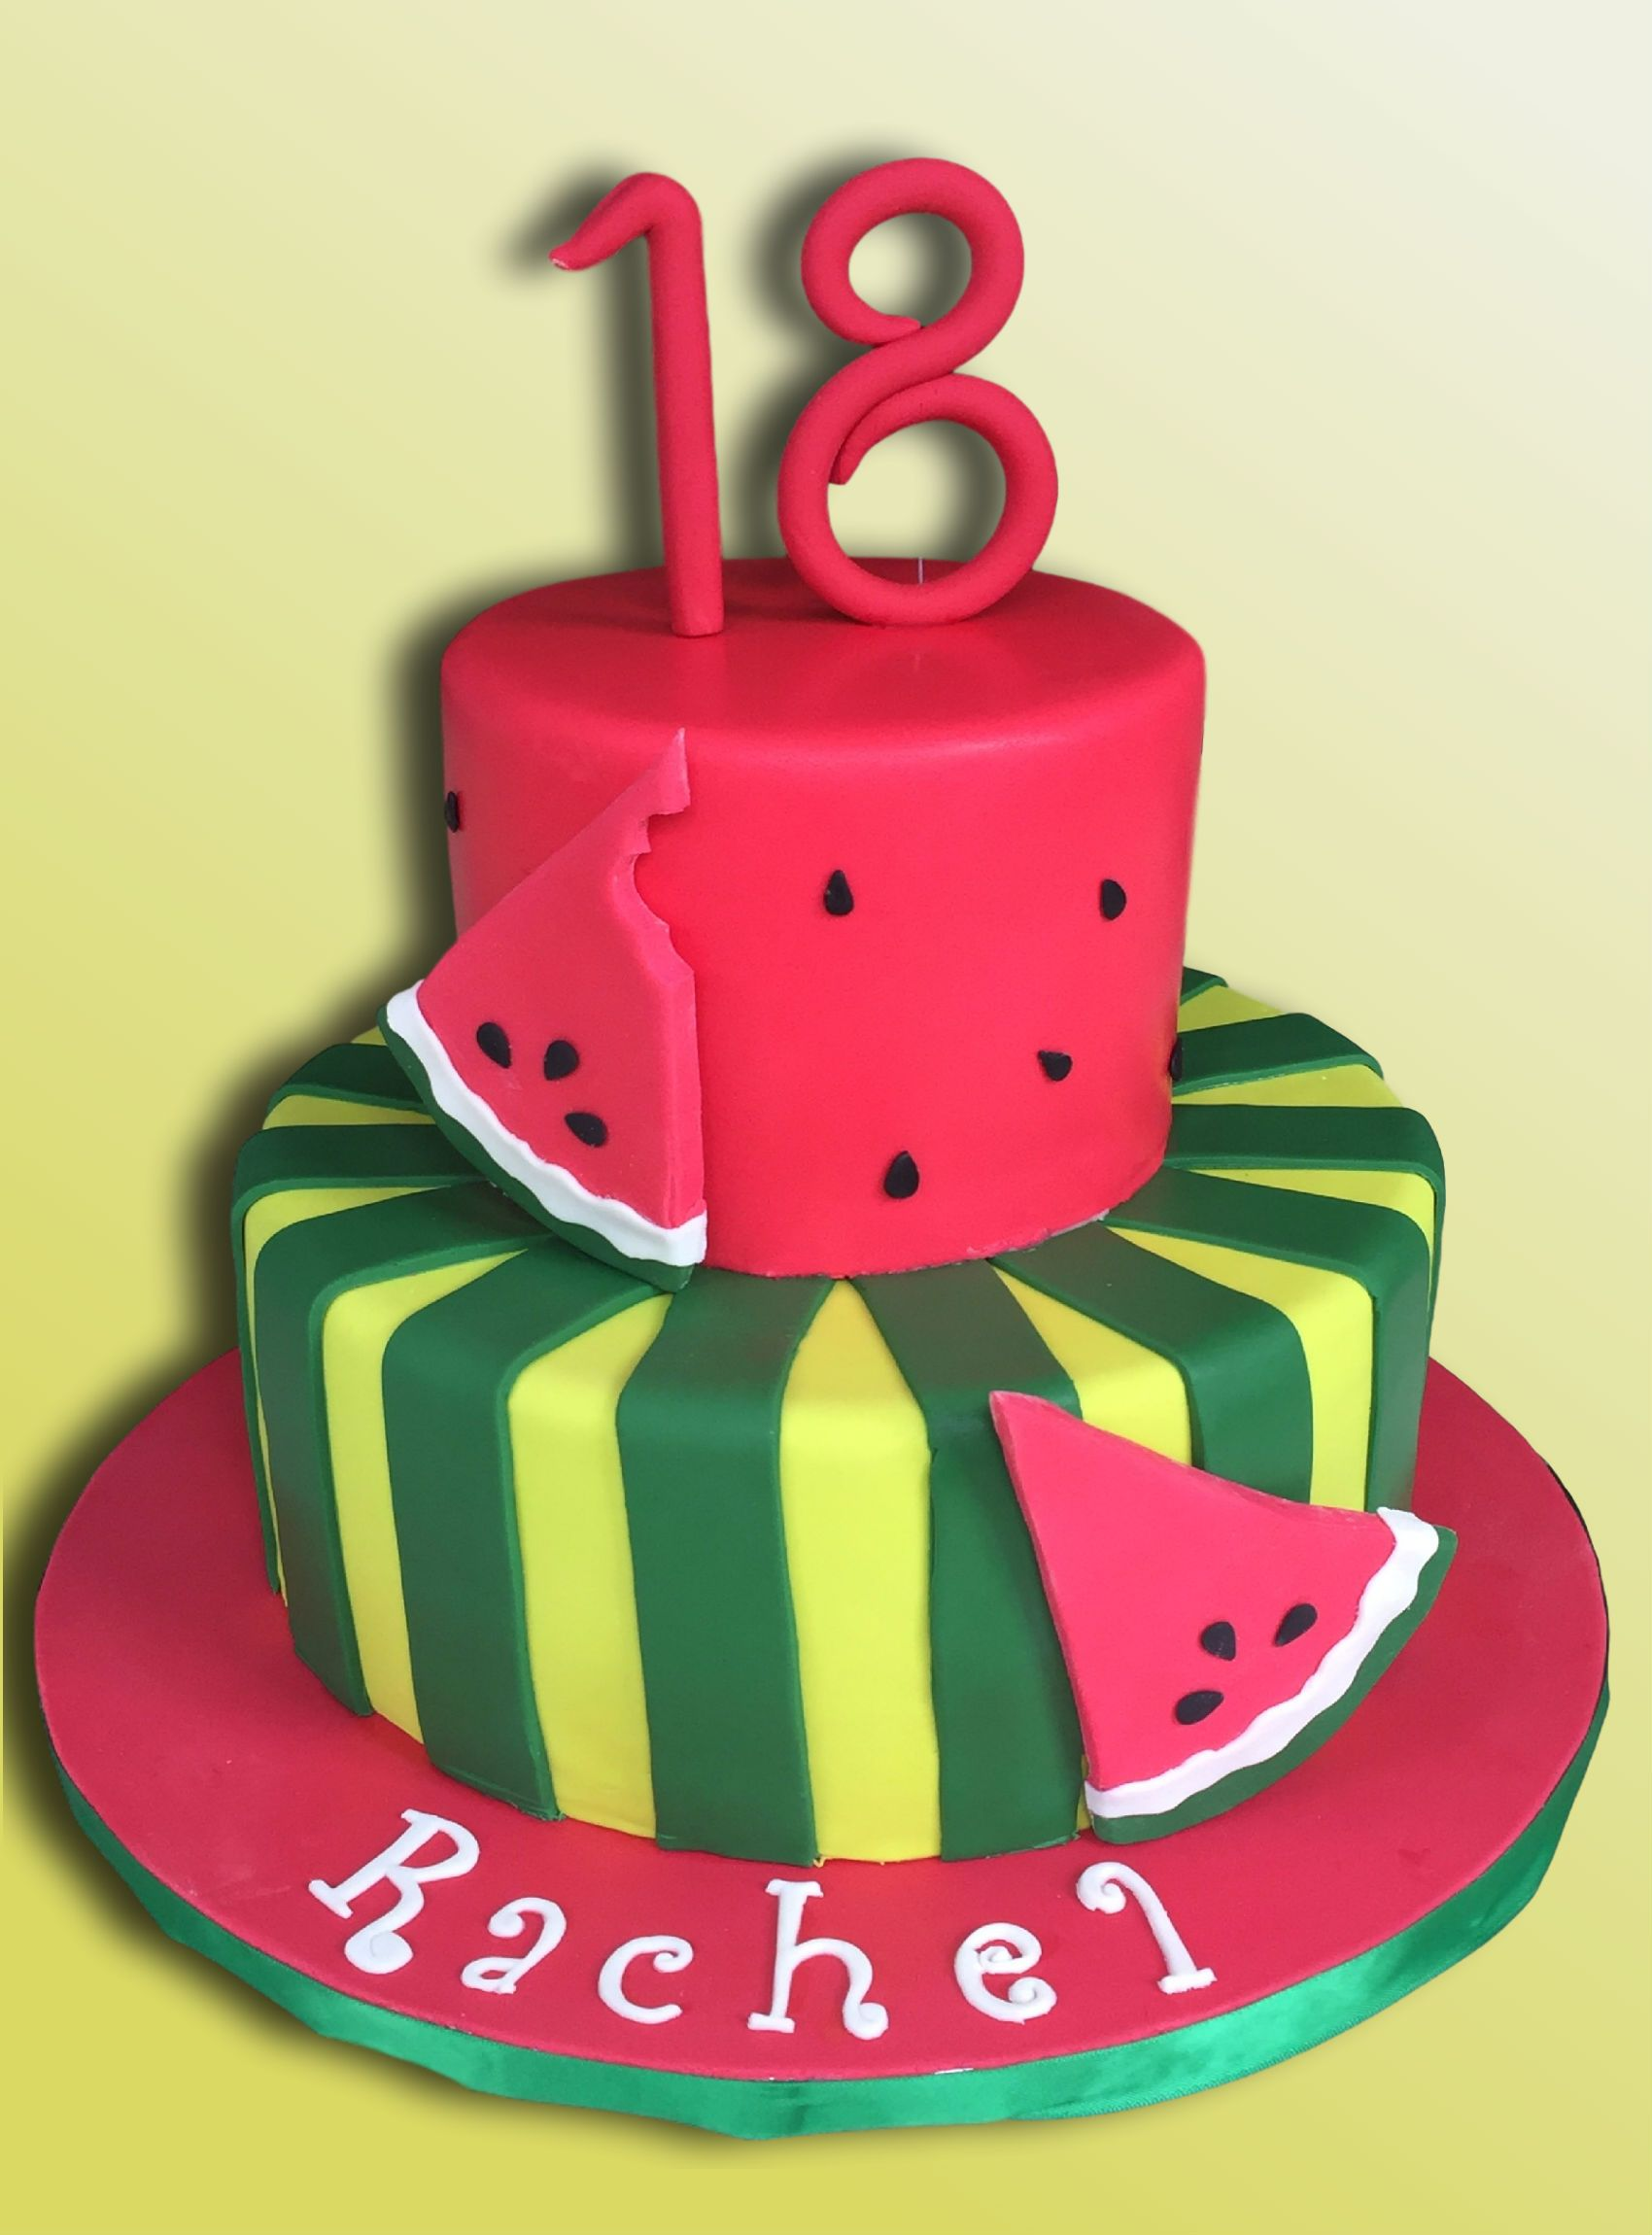 Fondant Cakes In Tucson Az